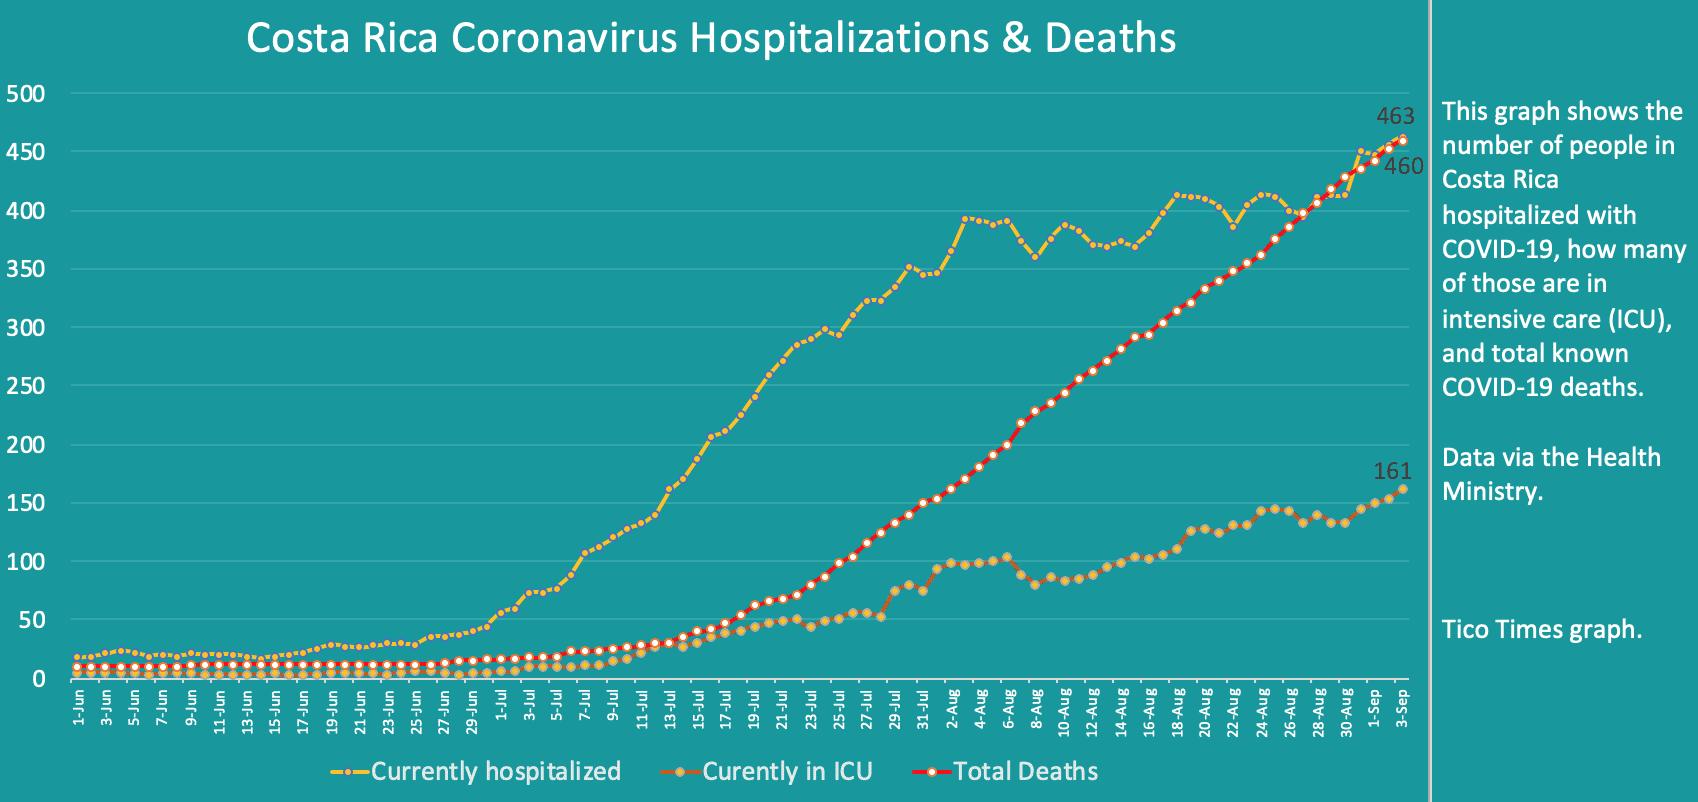 Costa Rica coronavirus hospitalizations and deaths on September 3, 2020